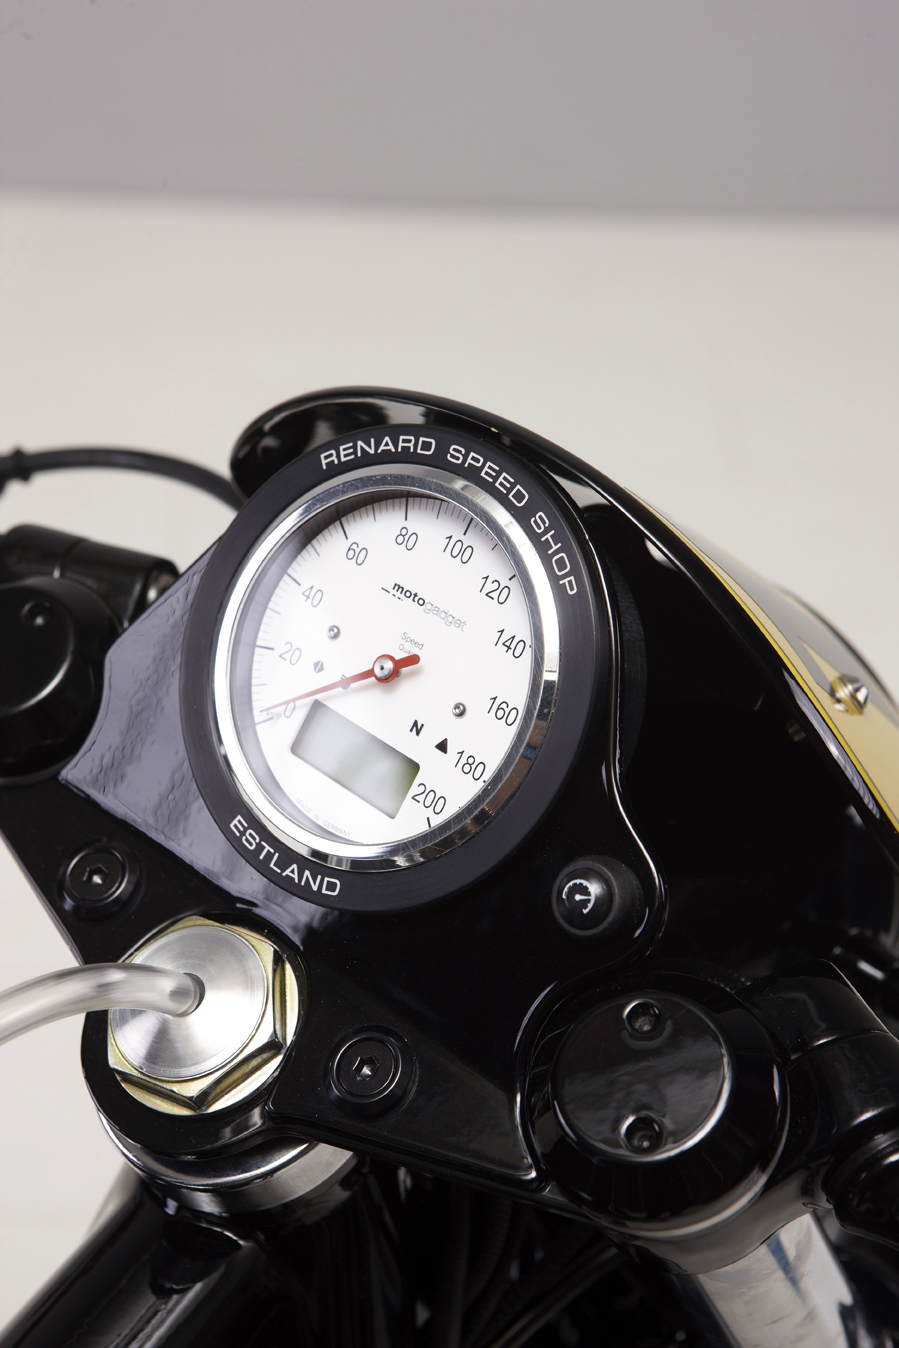 BMW R60 Factory Racer by Renard Speed Shop